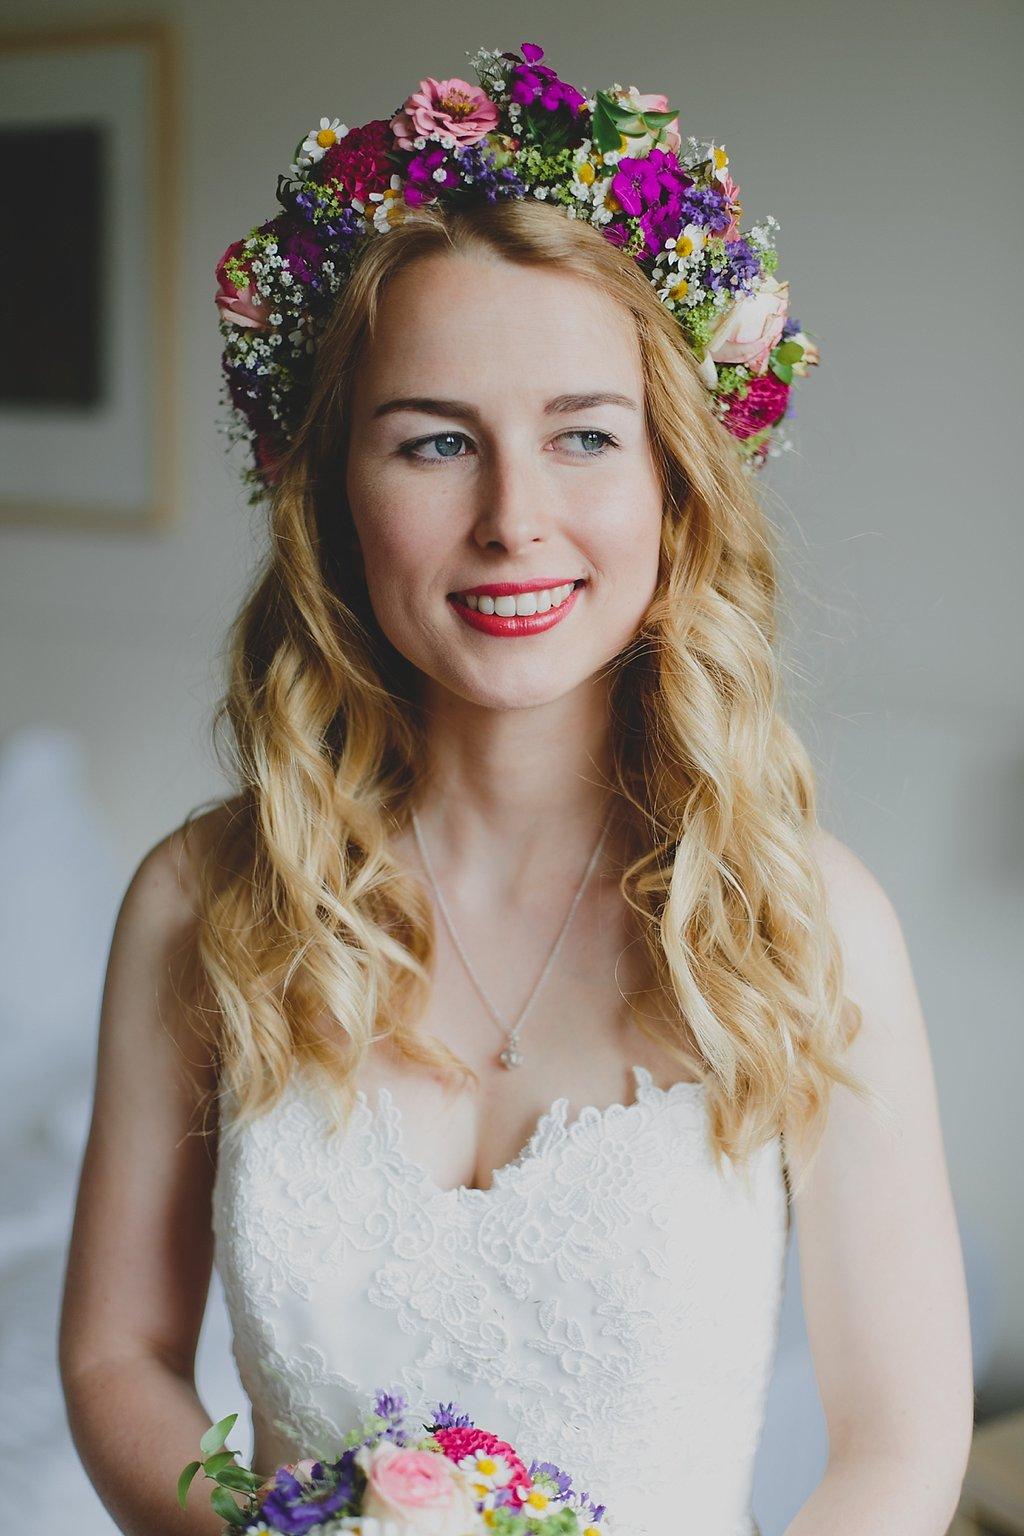 Boho Braut Blumenkranz